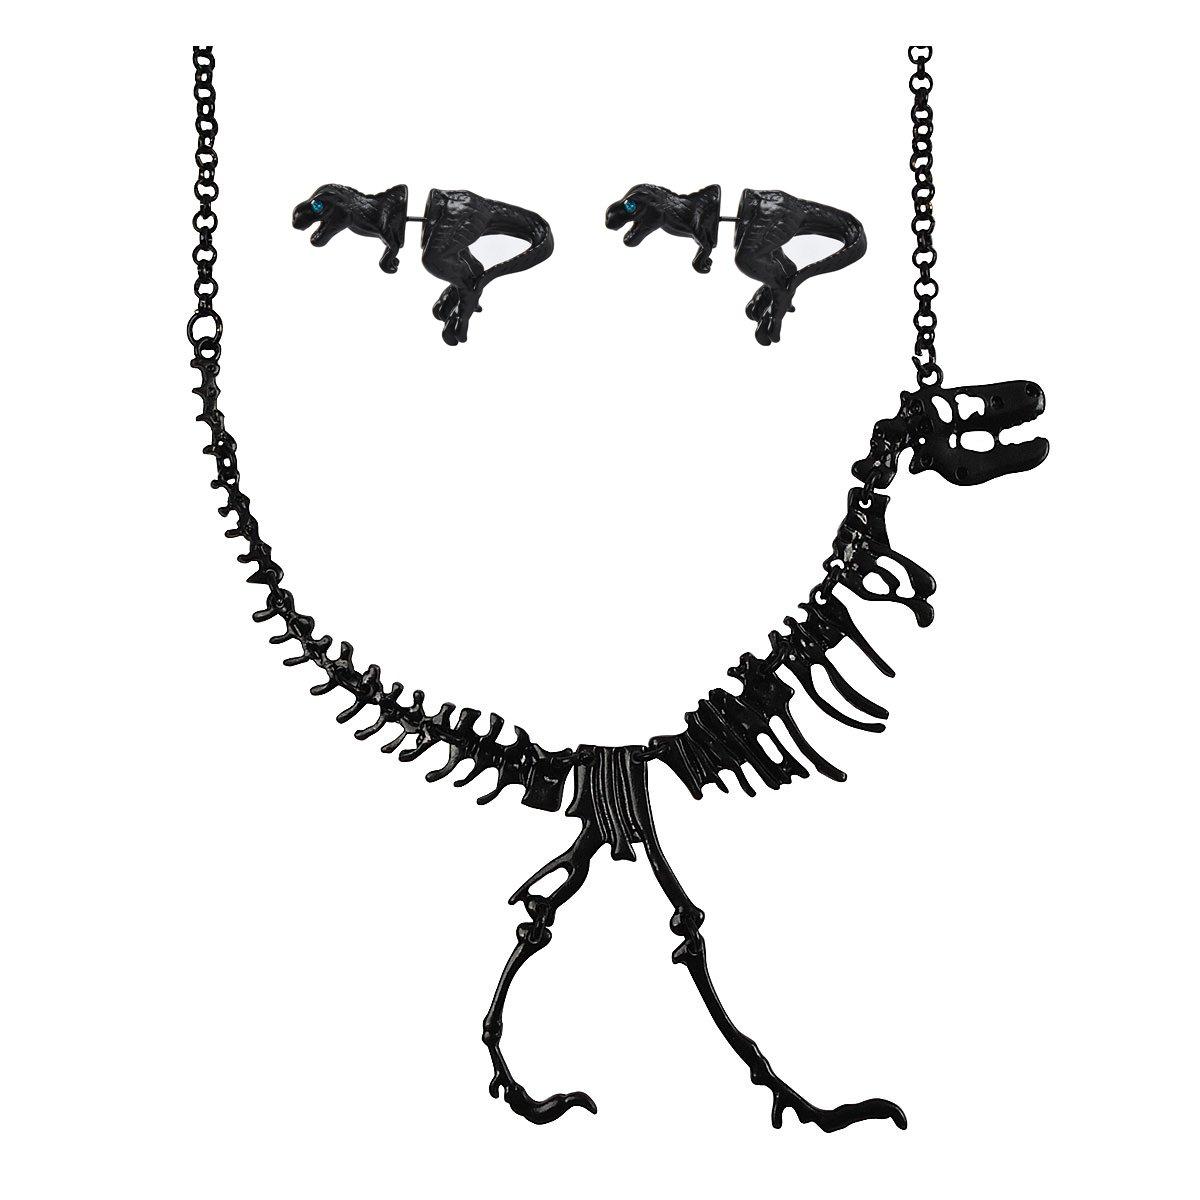 Jane Stone Black Dinosaur Necklace Earrings Short Statement Jewelry Set